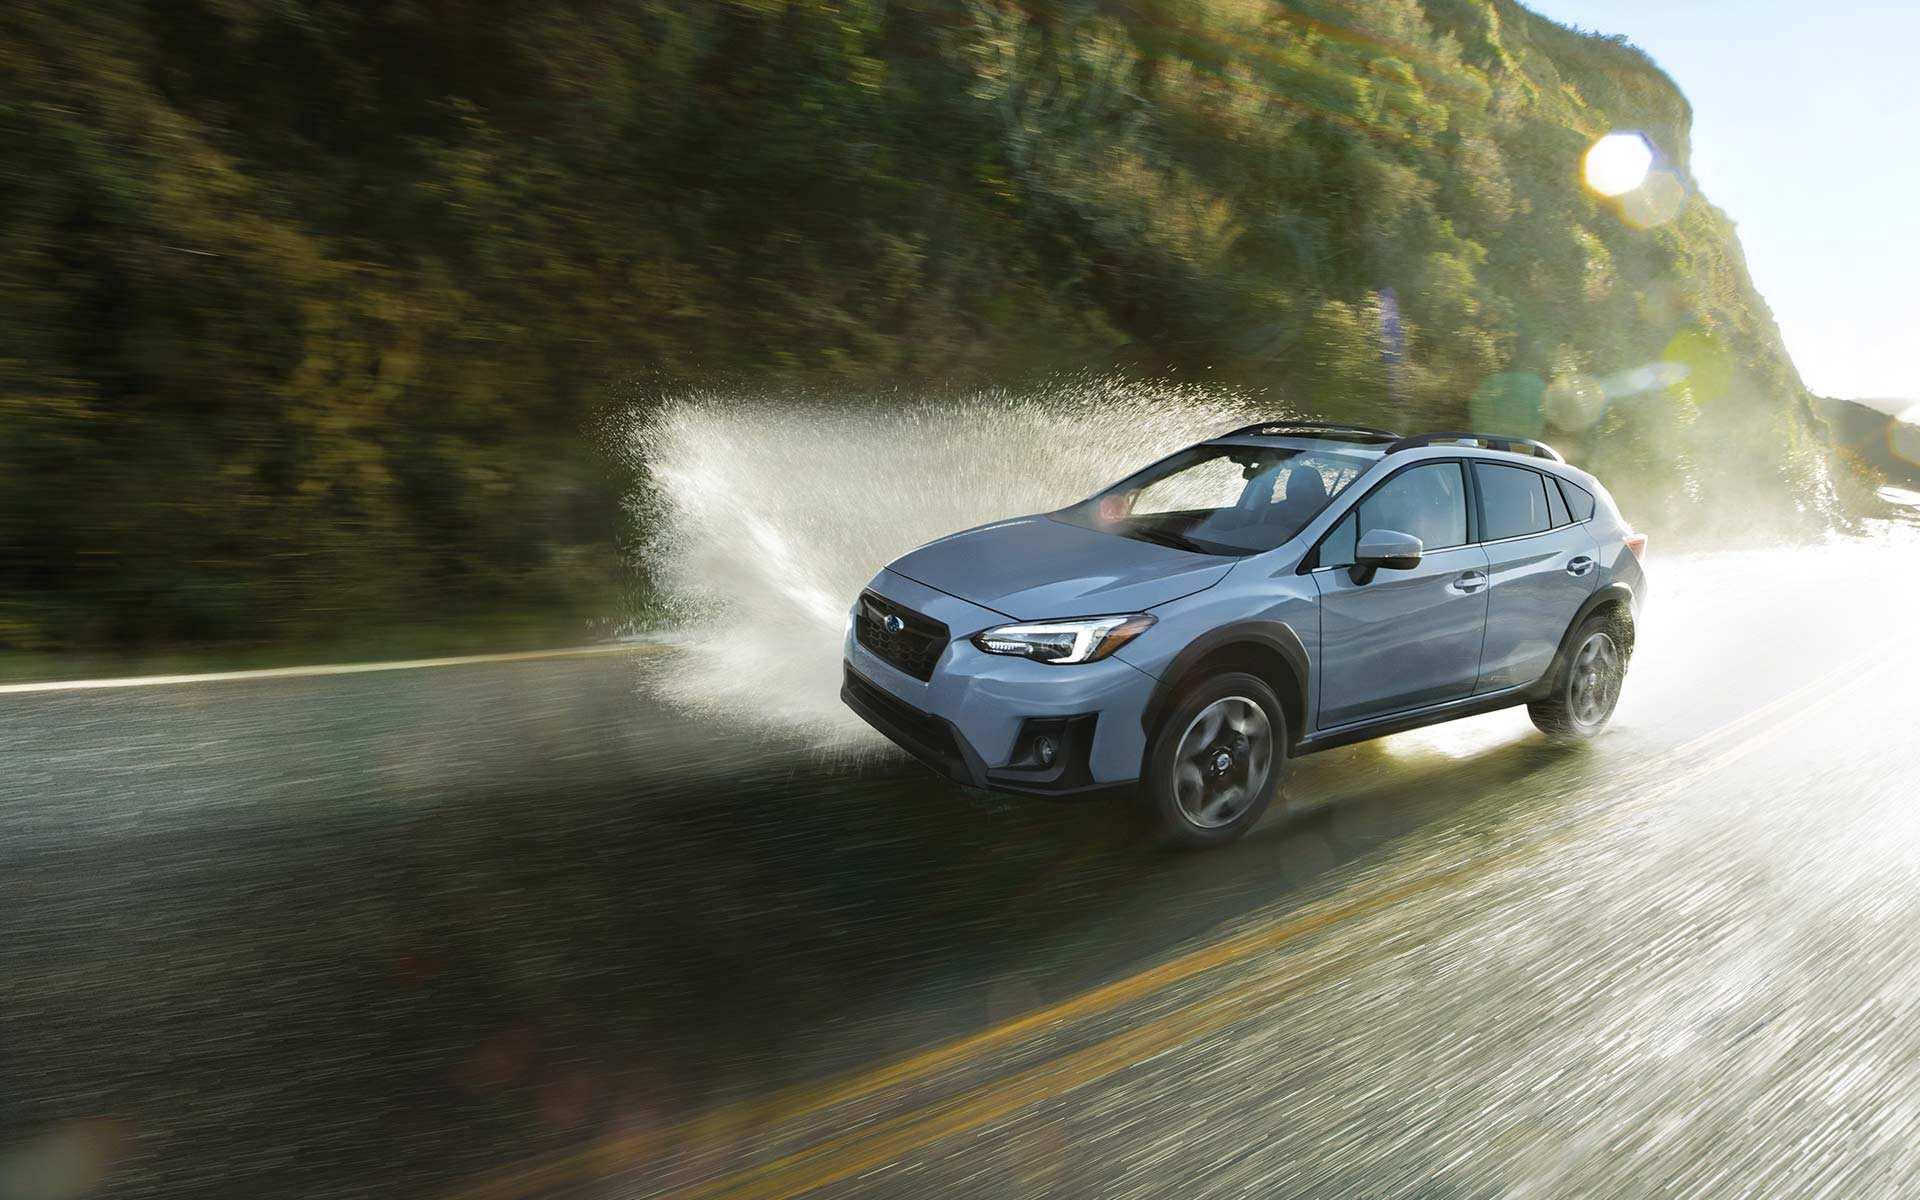 31 New 2019 Subaru Vehicles Exterior with 2019 Subaru Vehicles